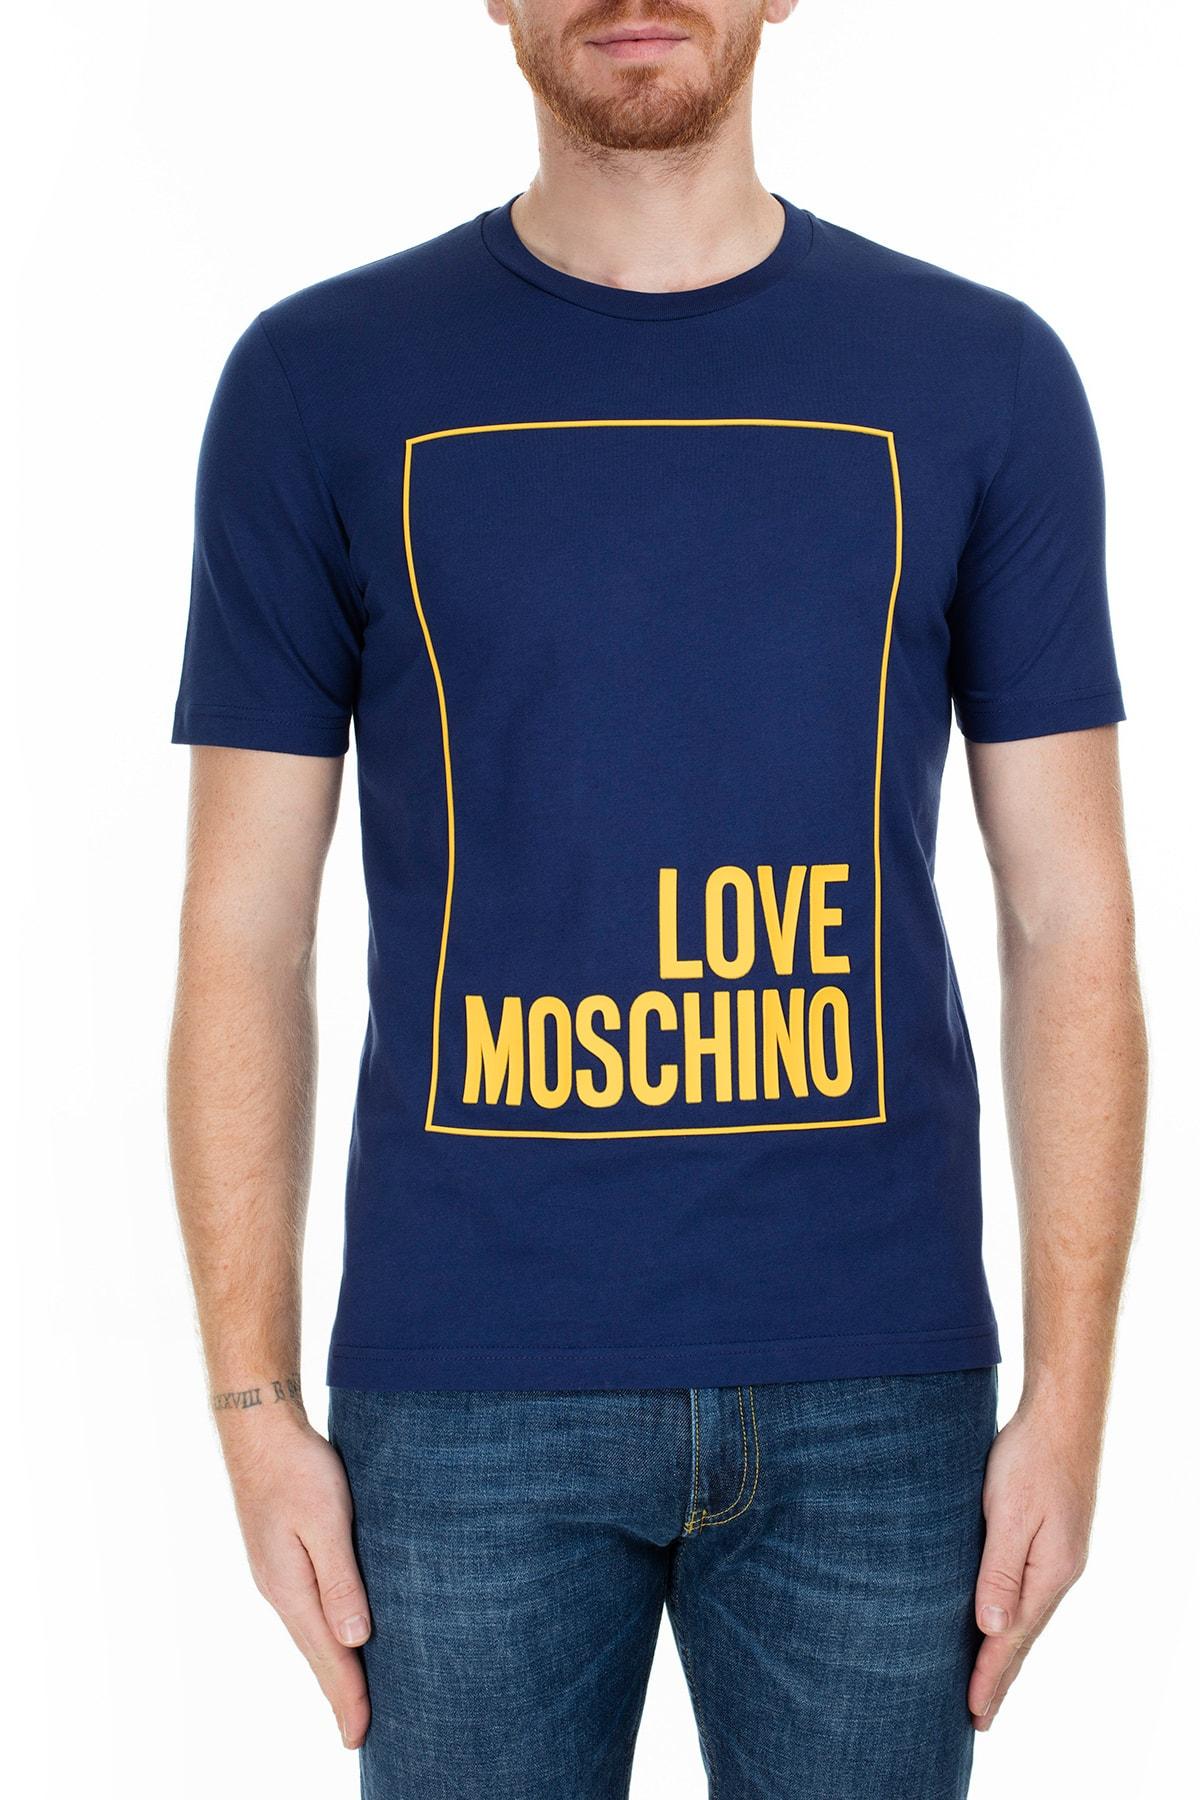 Love Moschino Erkek Lacivert T-Shirt S M47322Rm3876 Y56 1